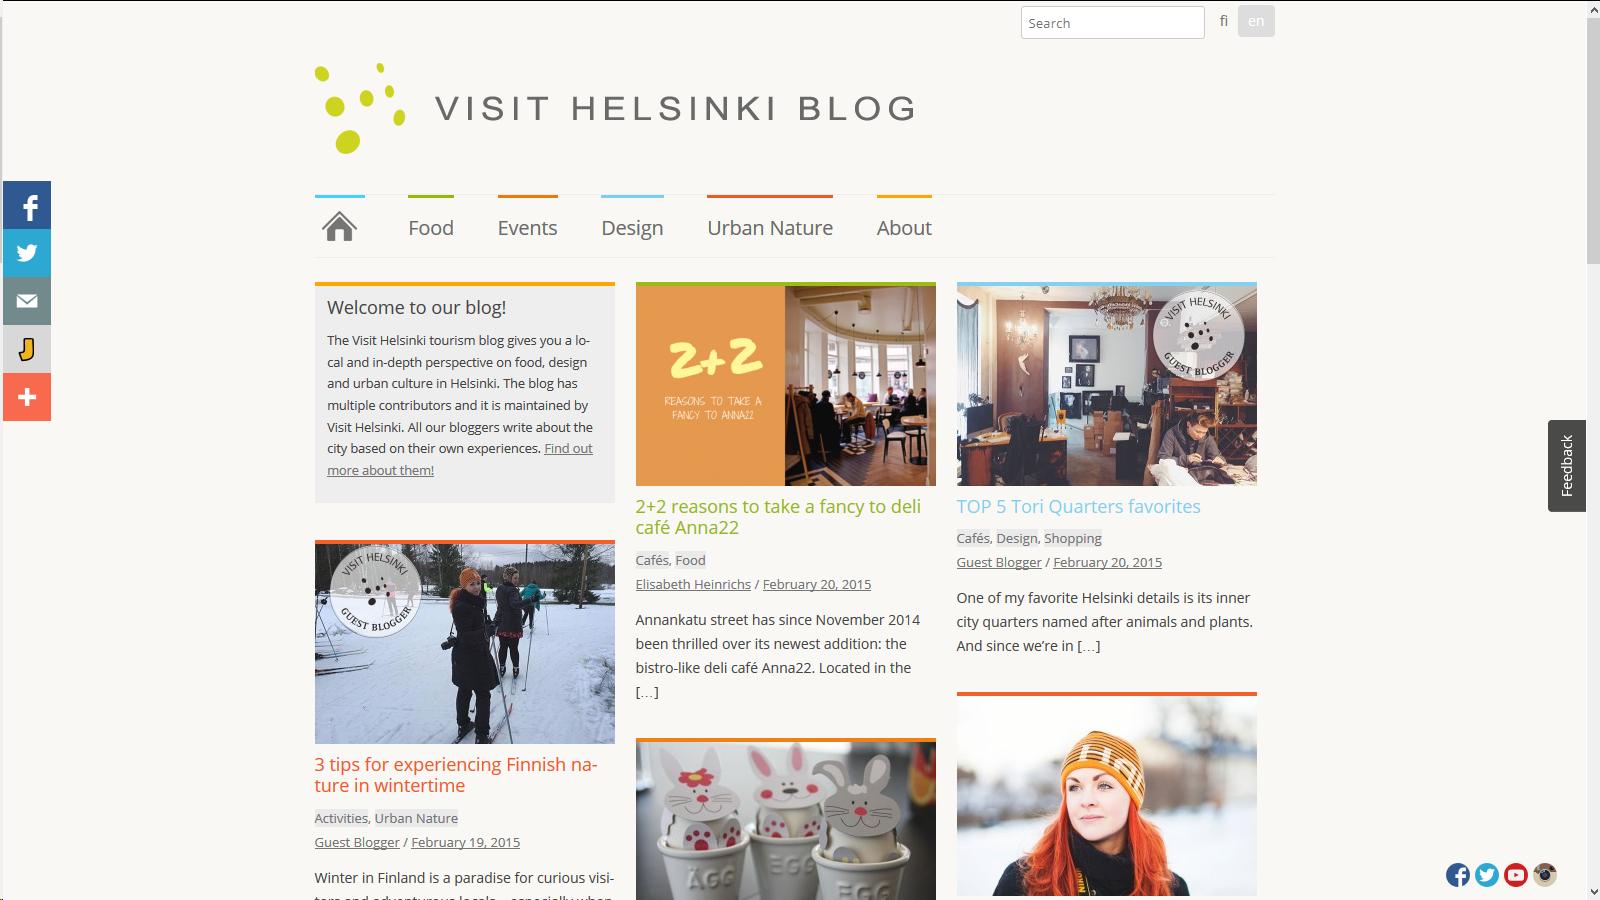 Visit Helsinki Blog